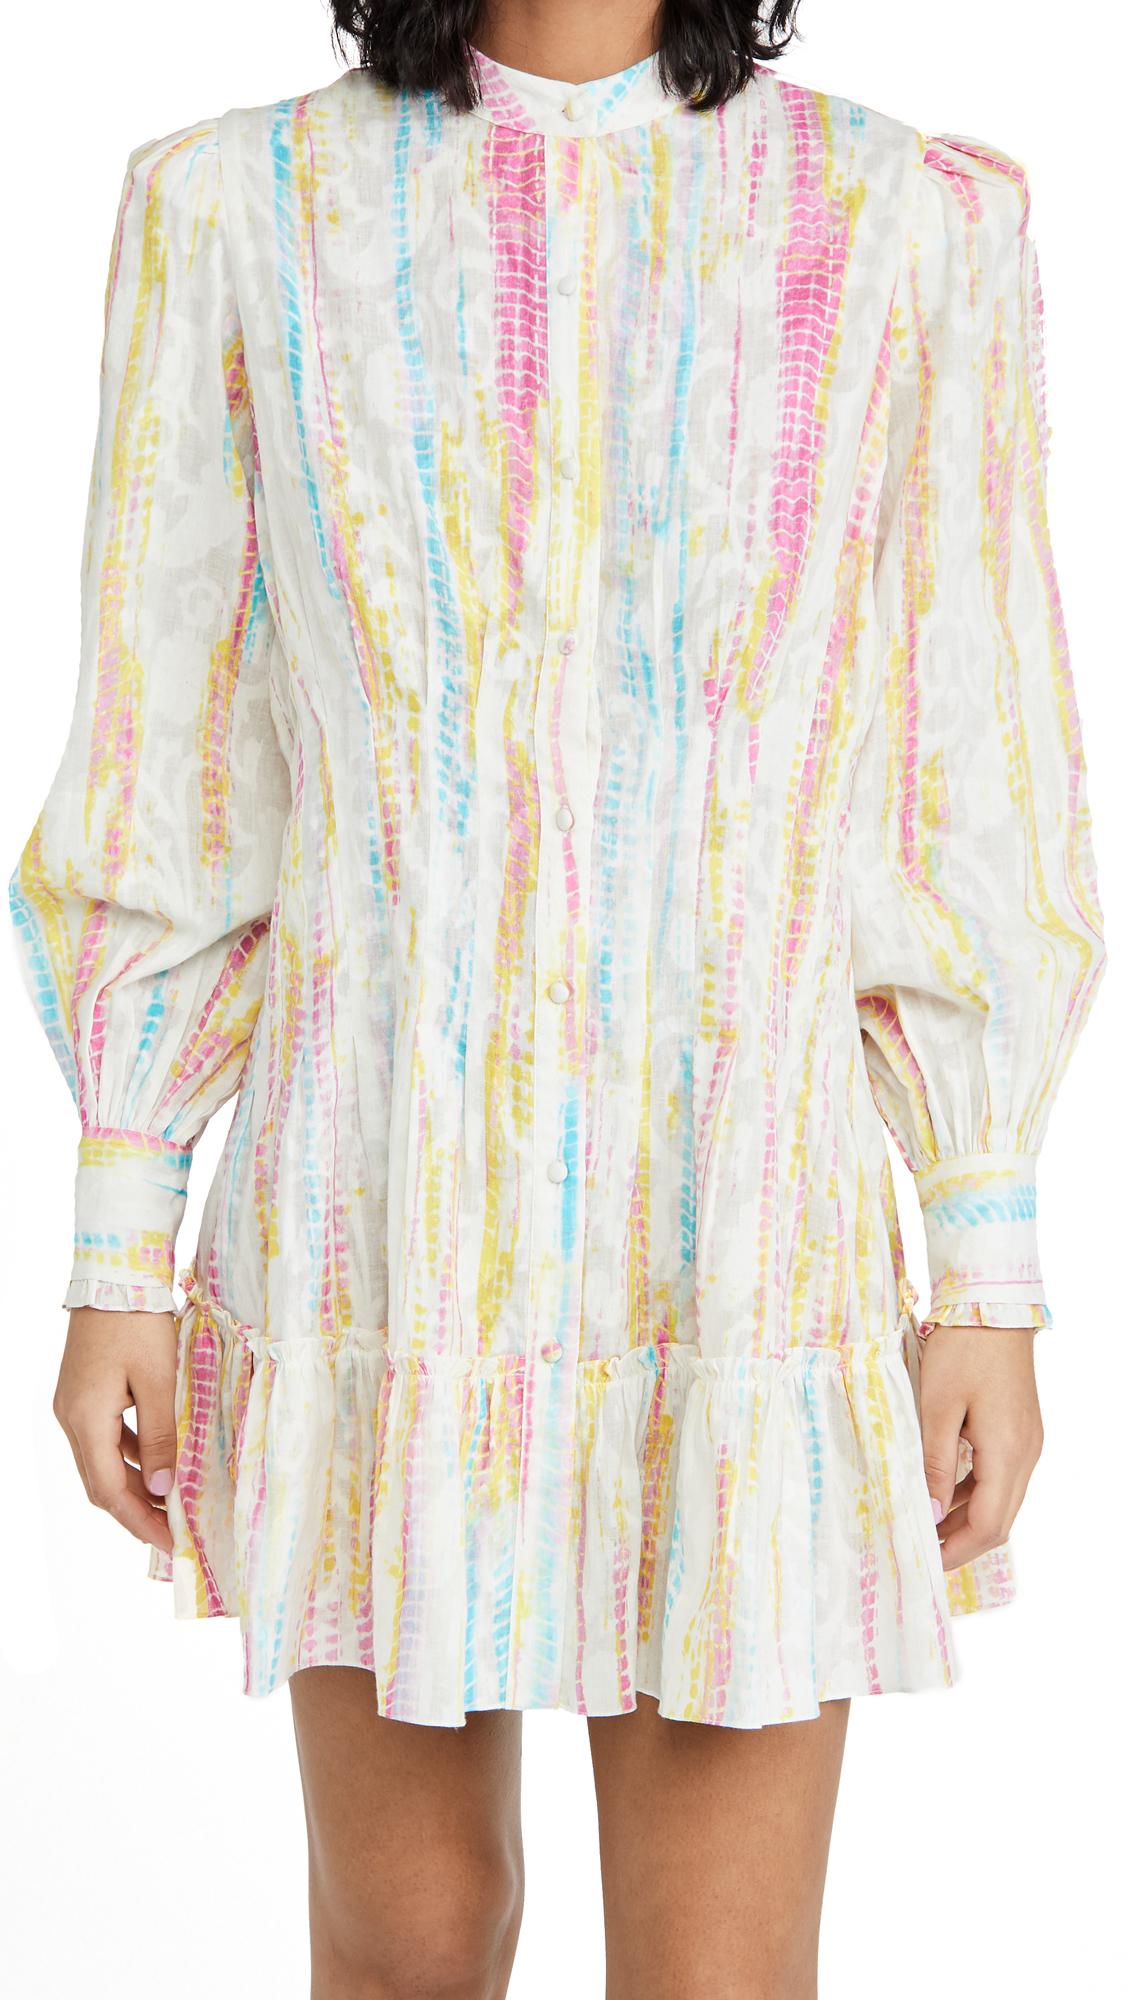 Hemant and Nandita Cover Up Shirtdress